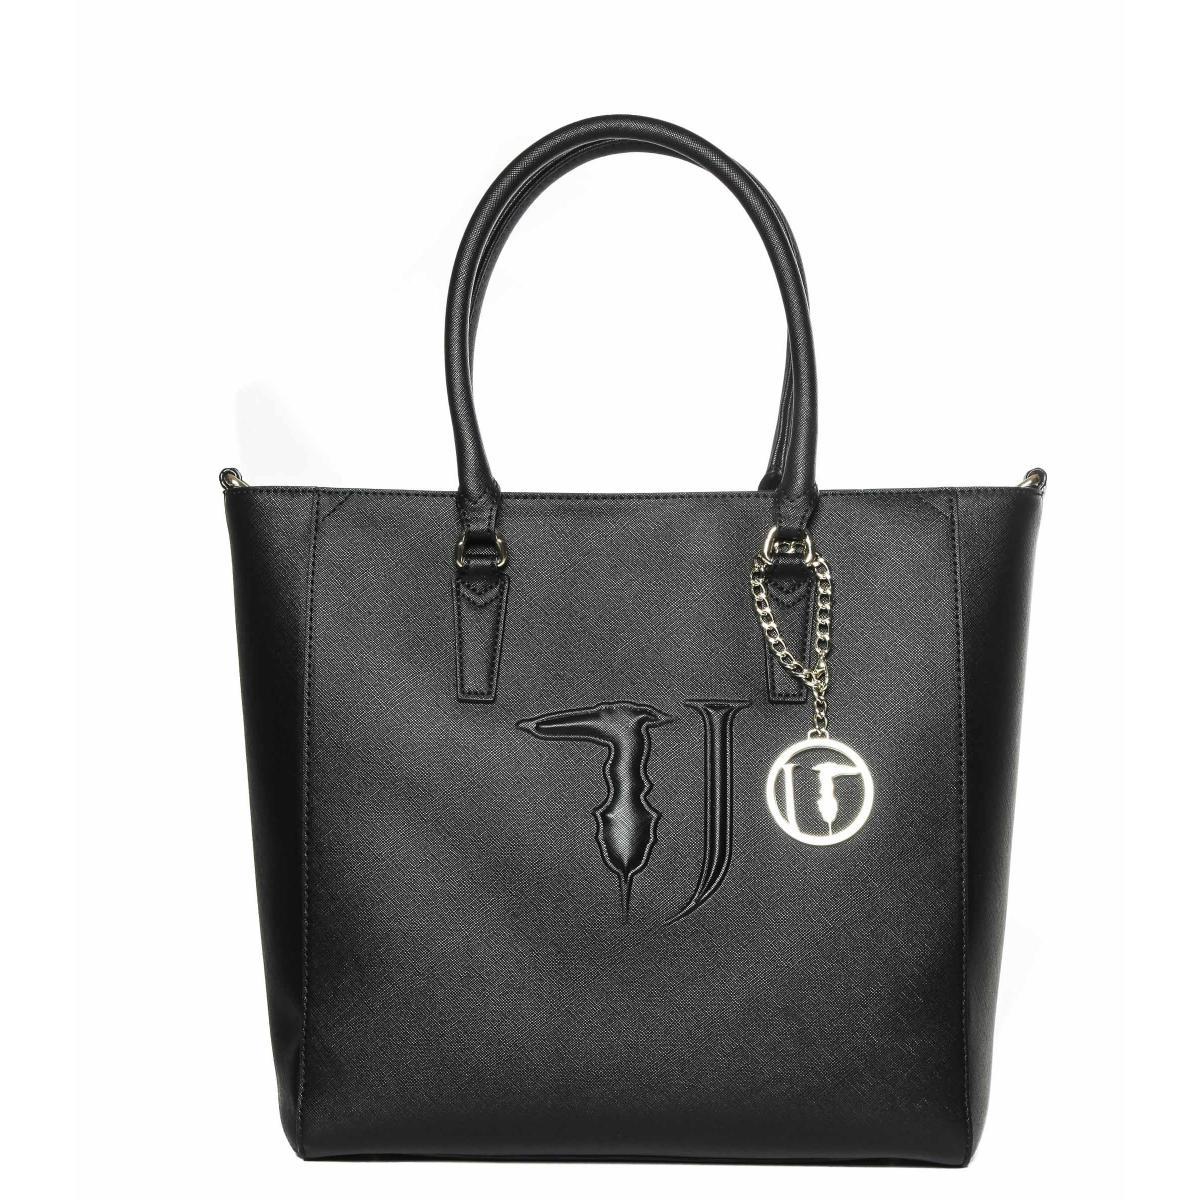 Borsa TRUSSARDI Ischia Ecoleather Shopping Bag rif. 75B00001 1Y090125